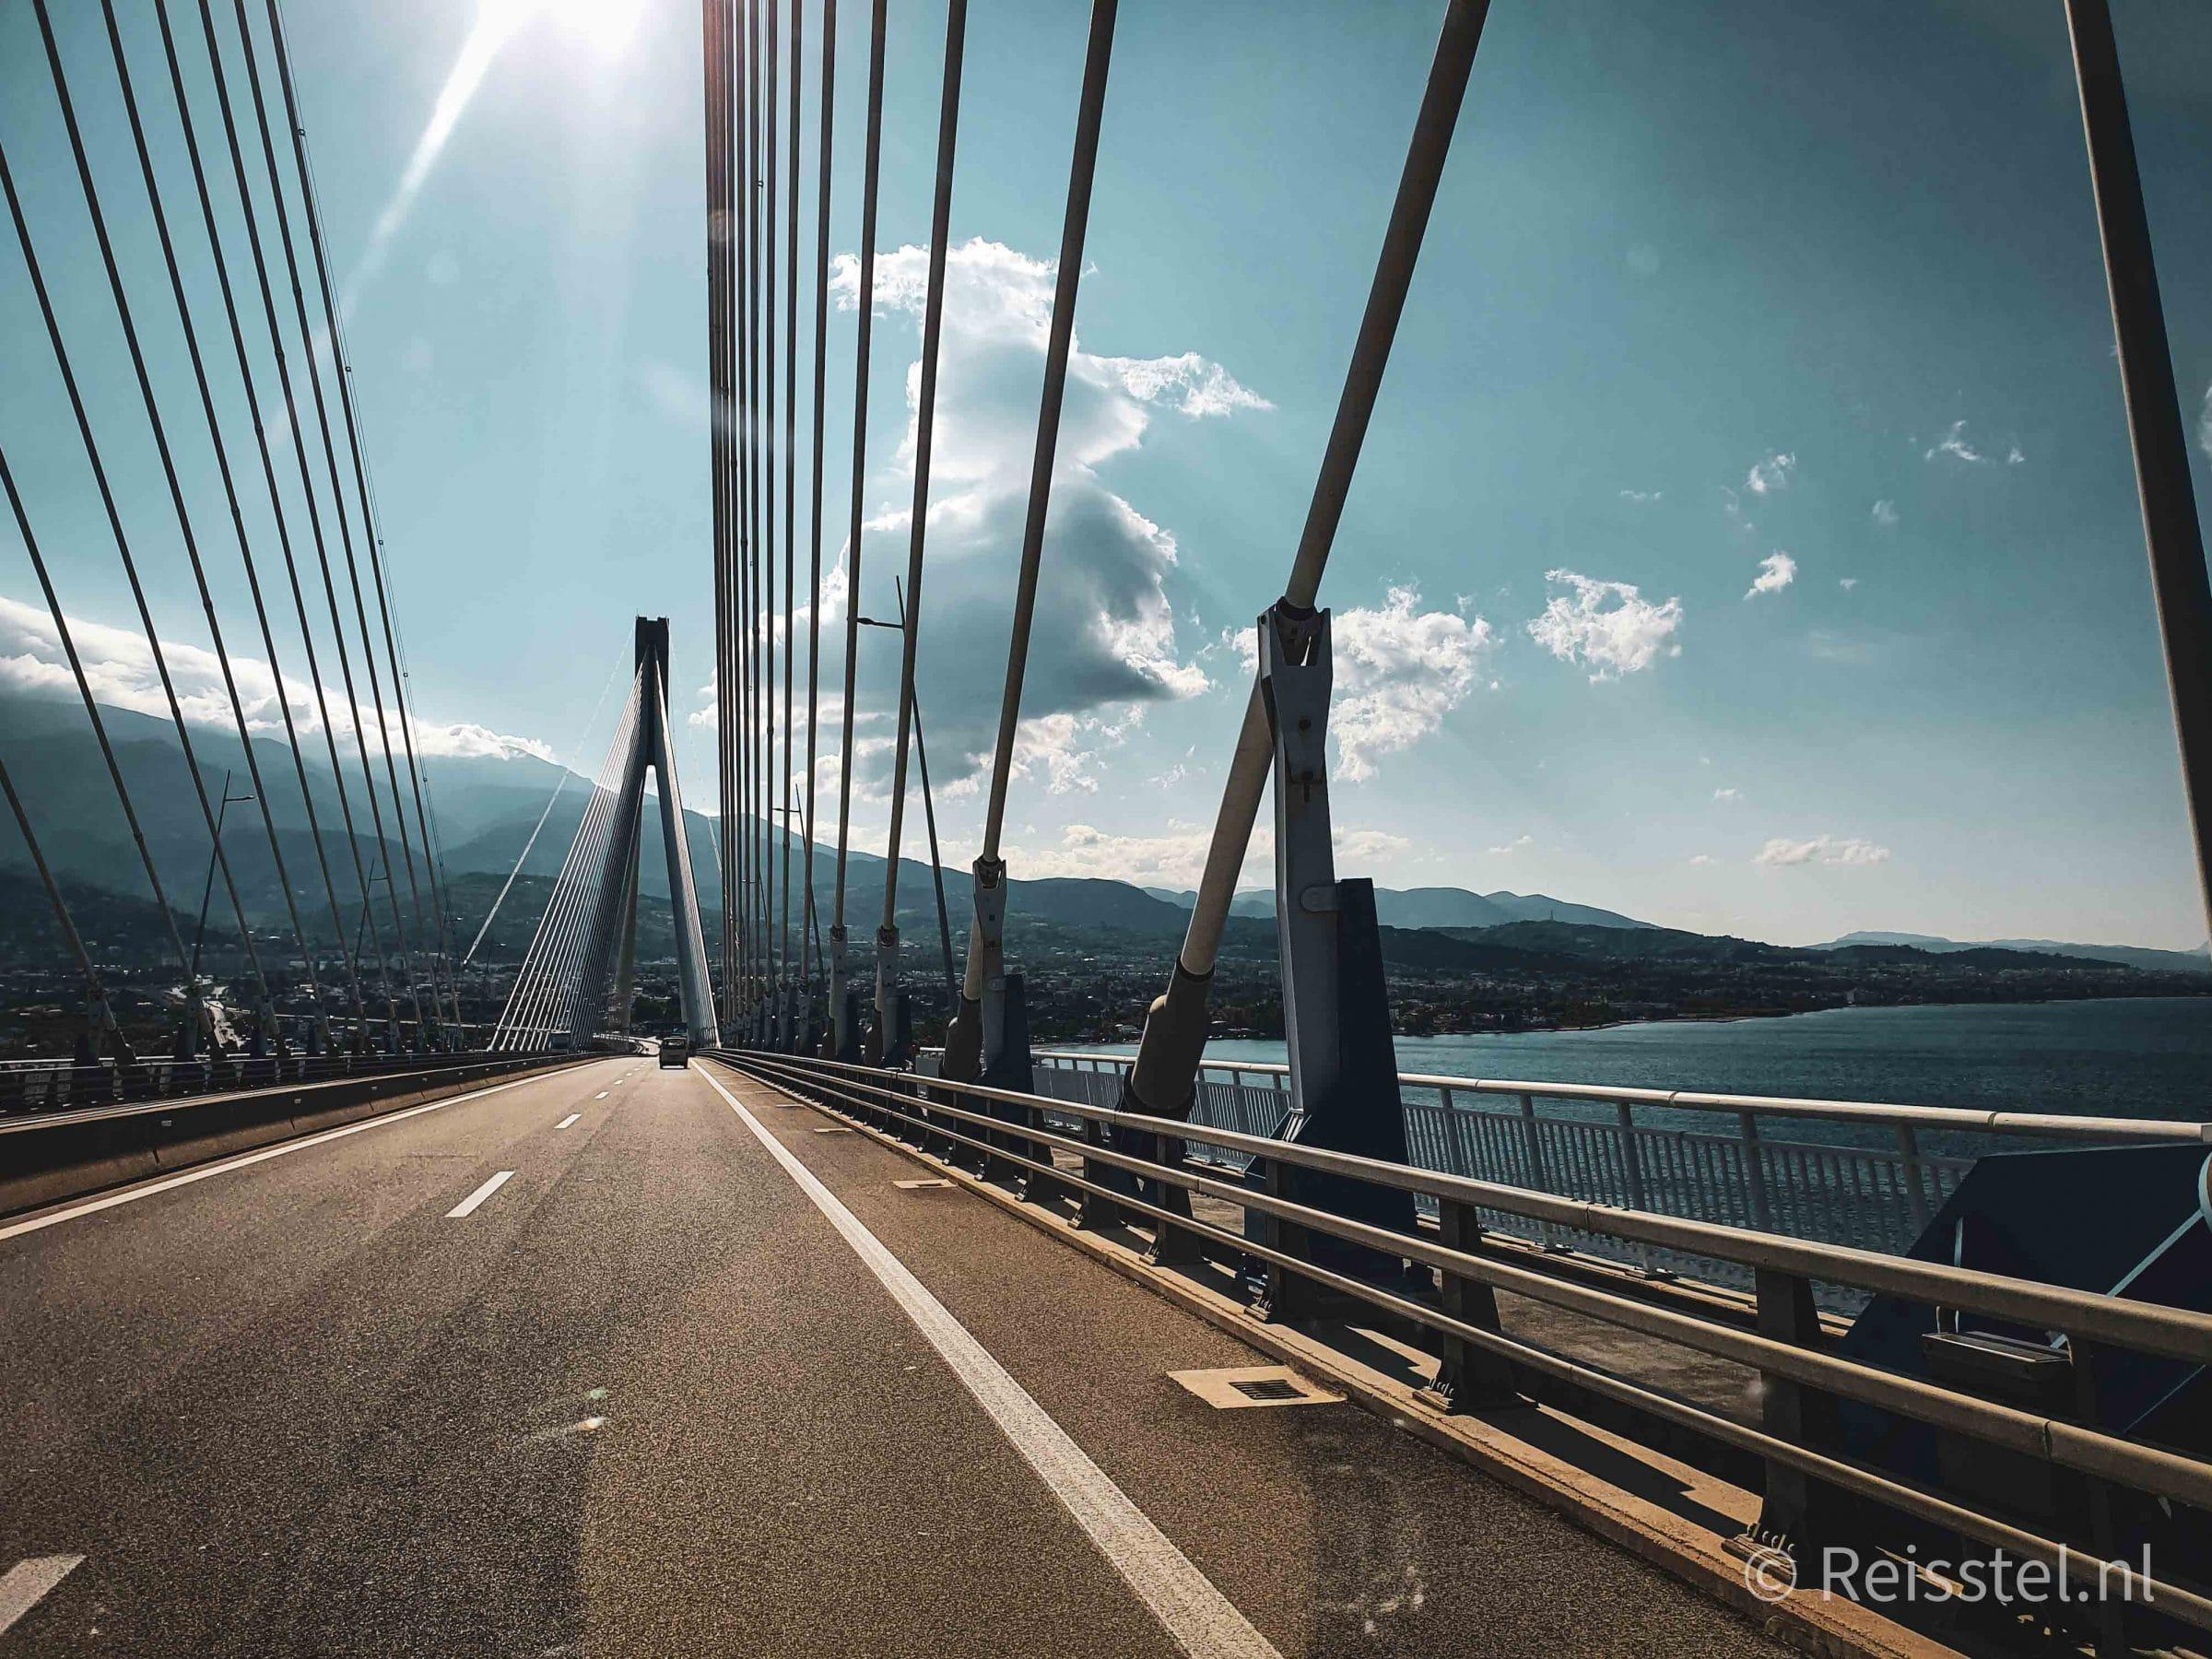 Reisstel.nl | Lockdown in Griekenland | Onderweg naar Peloponnesos